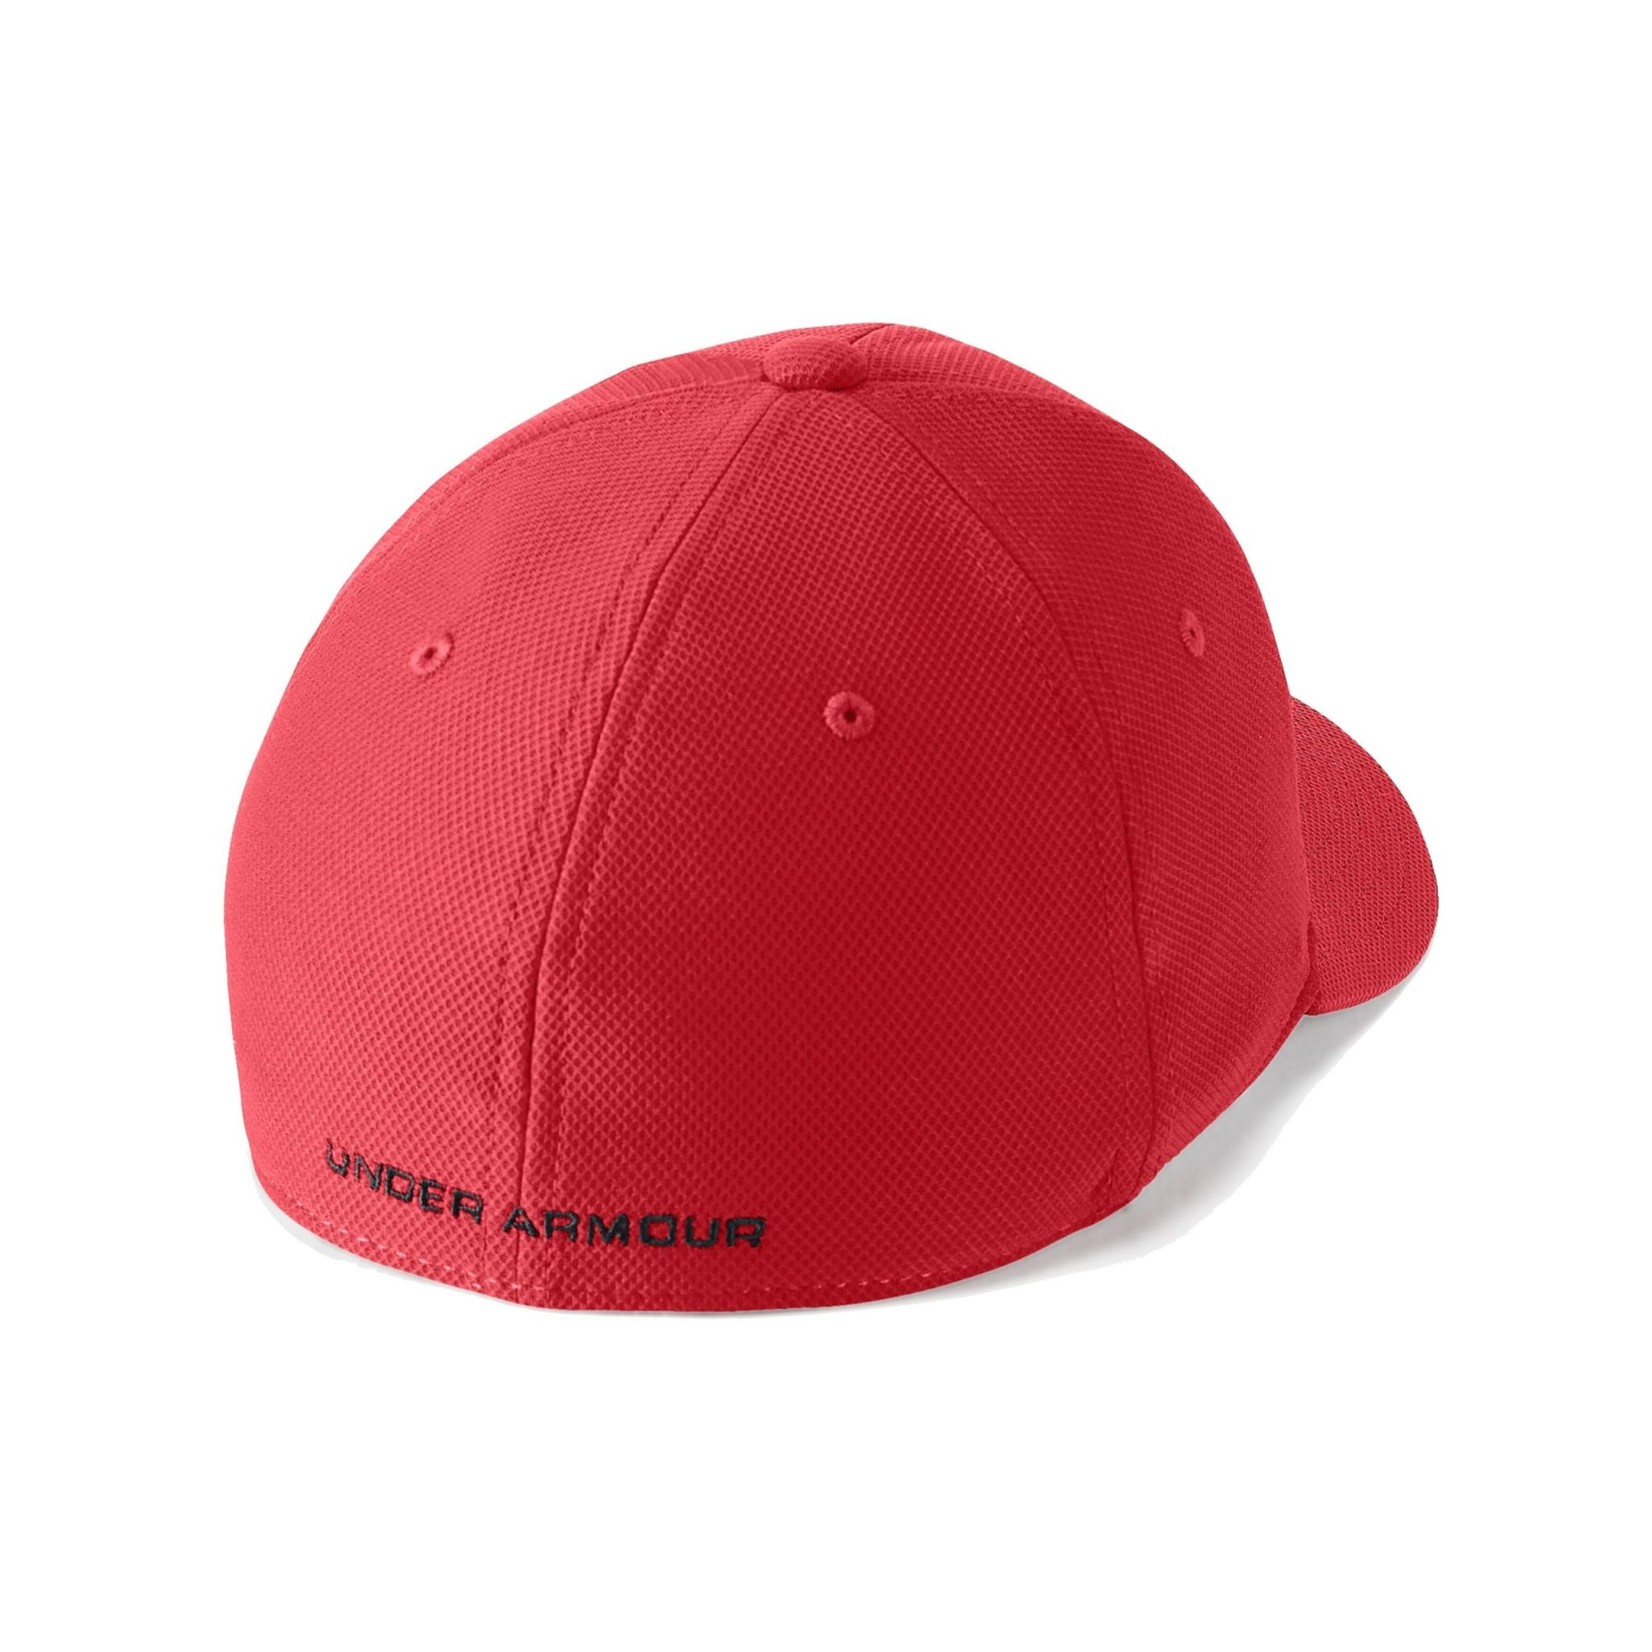 Under Armour Under Armour Hat, Blitzing 3.0, Boys